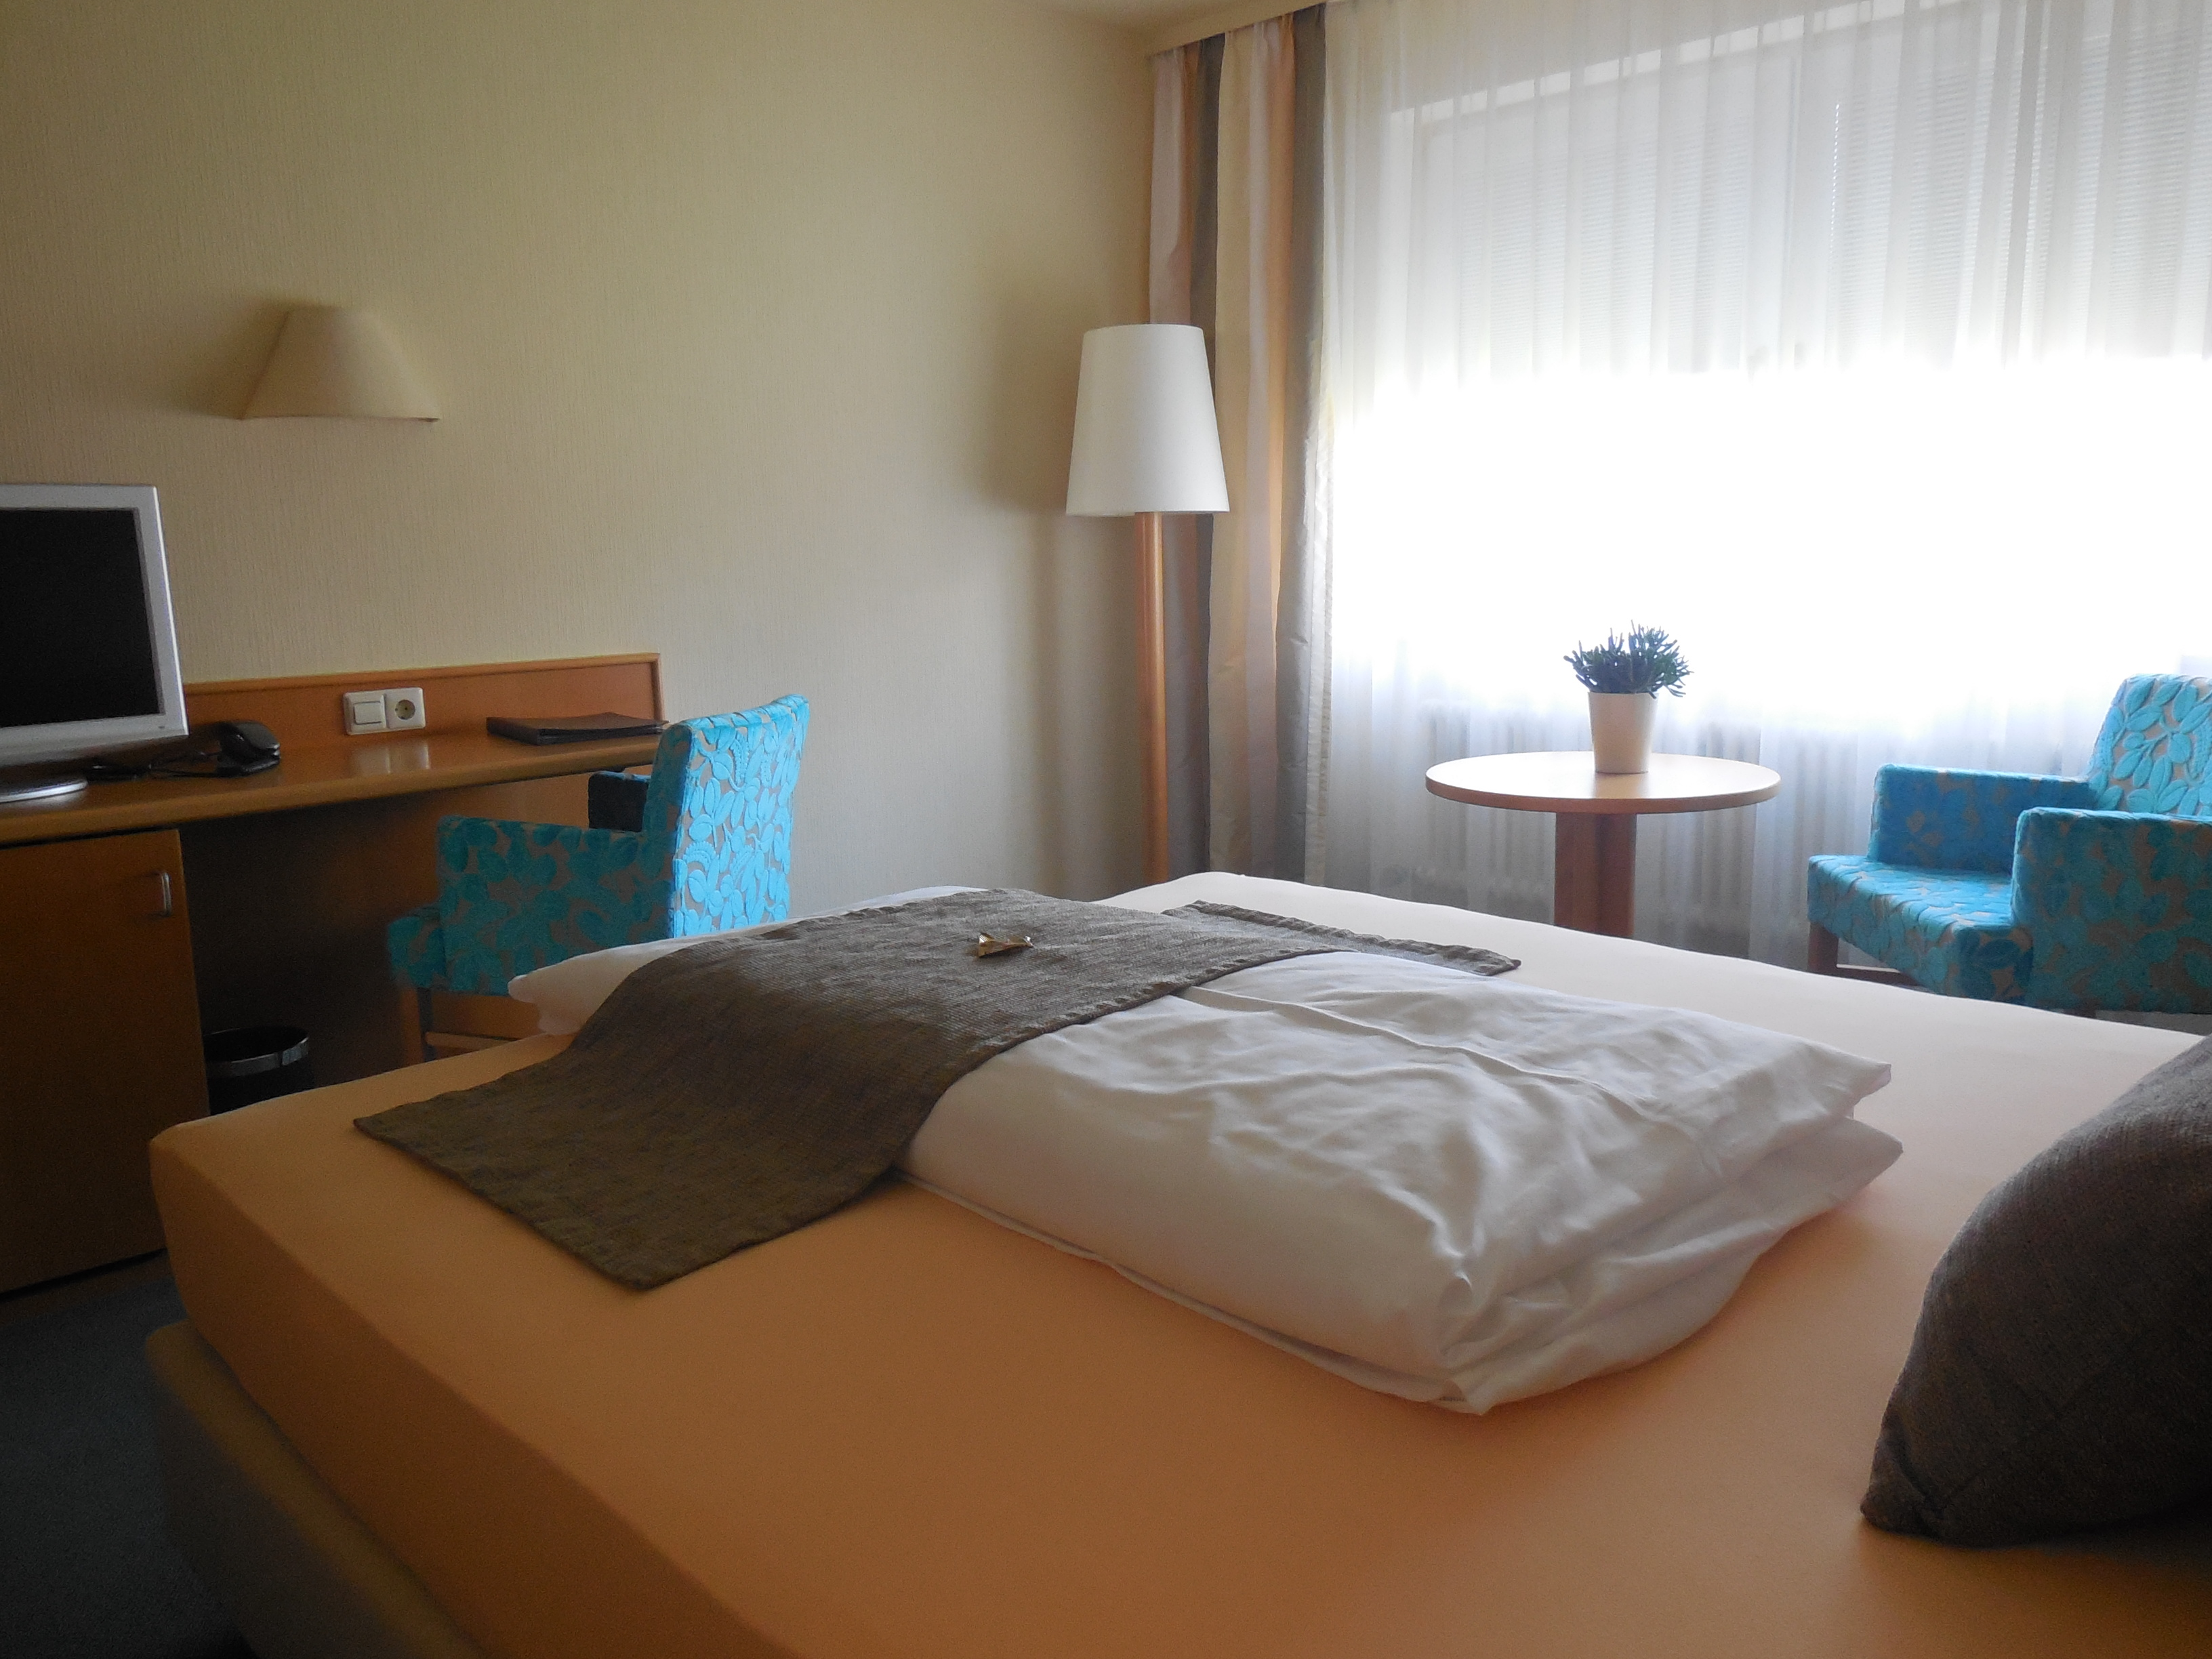 Zimmer hotel schober for Zimmer hotel